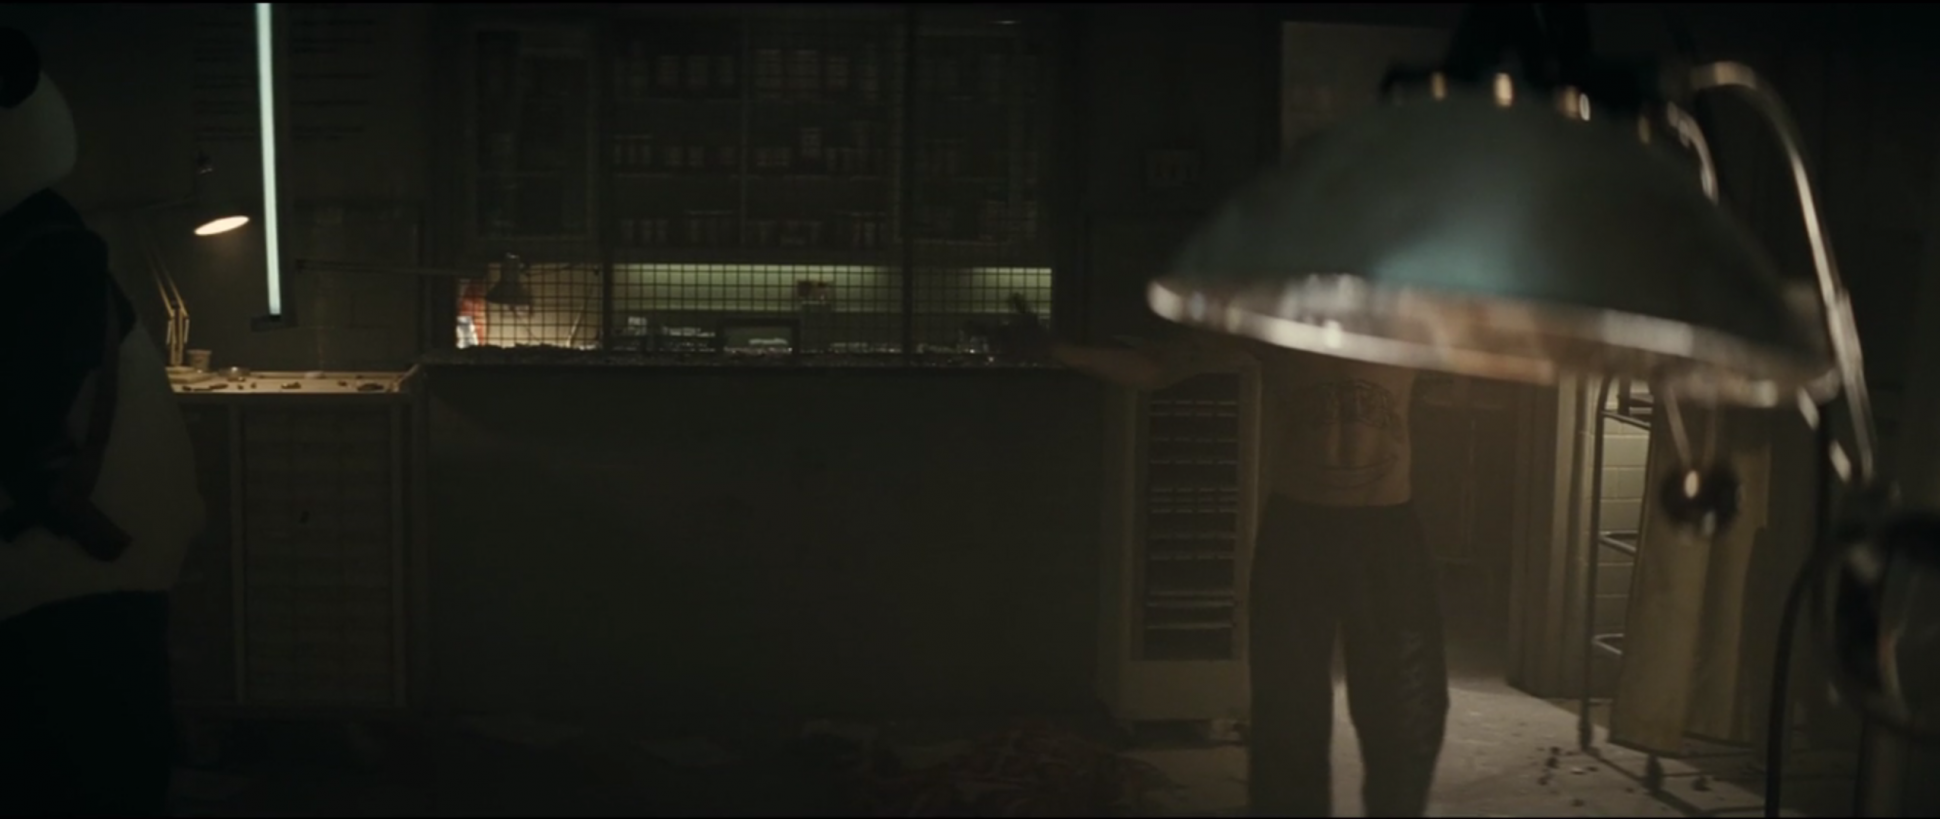 Harley quinn arkham asylum sex scenes 5